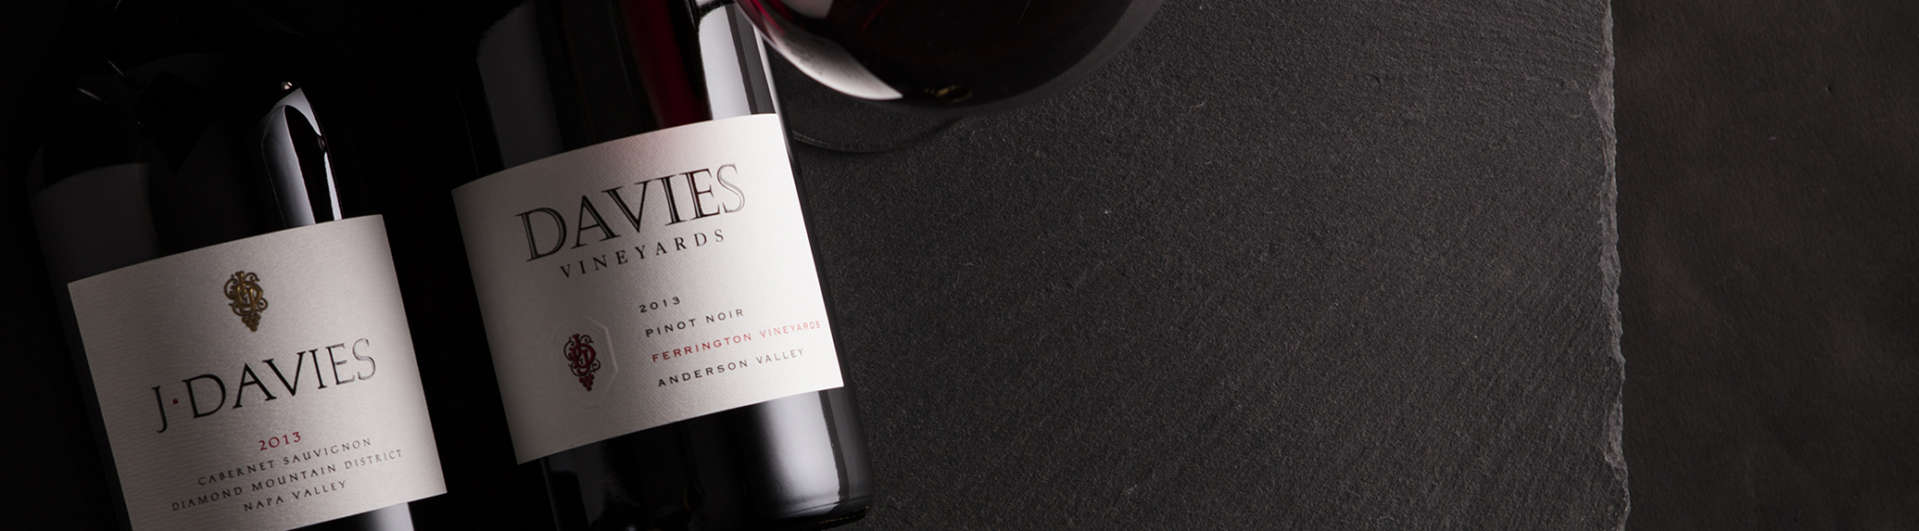 J. Davies Estate Cabernet Sauvignon and Davies Pinot Noirs